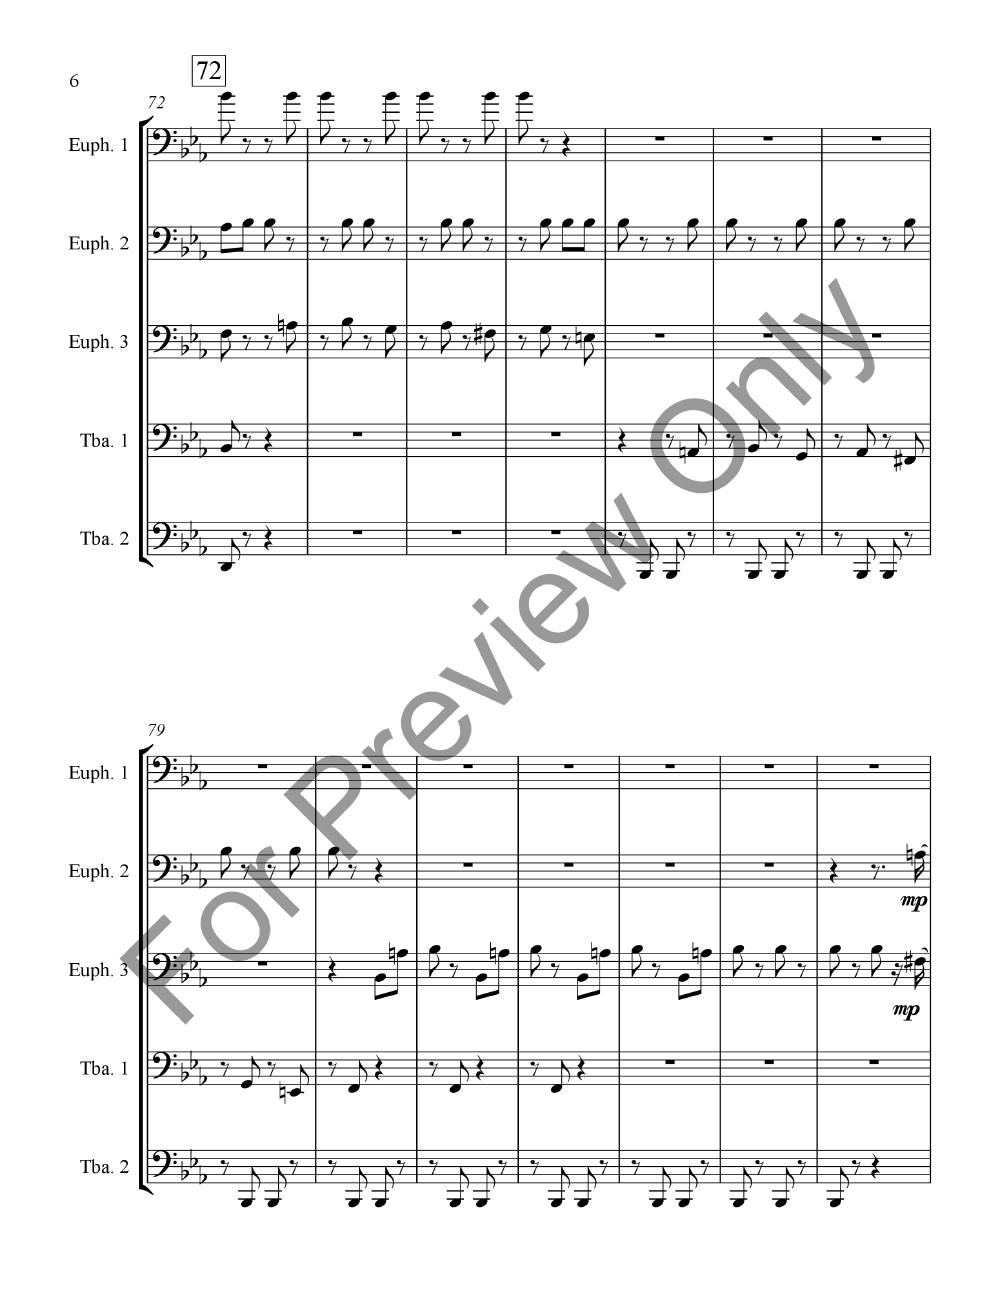 Serenade for Strings Movement 5 Thumbnail